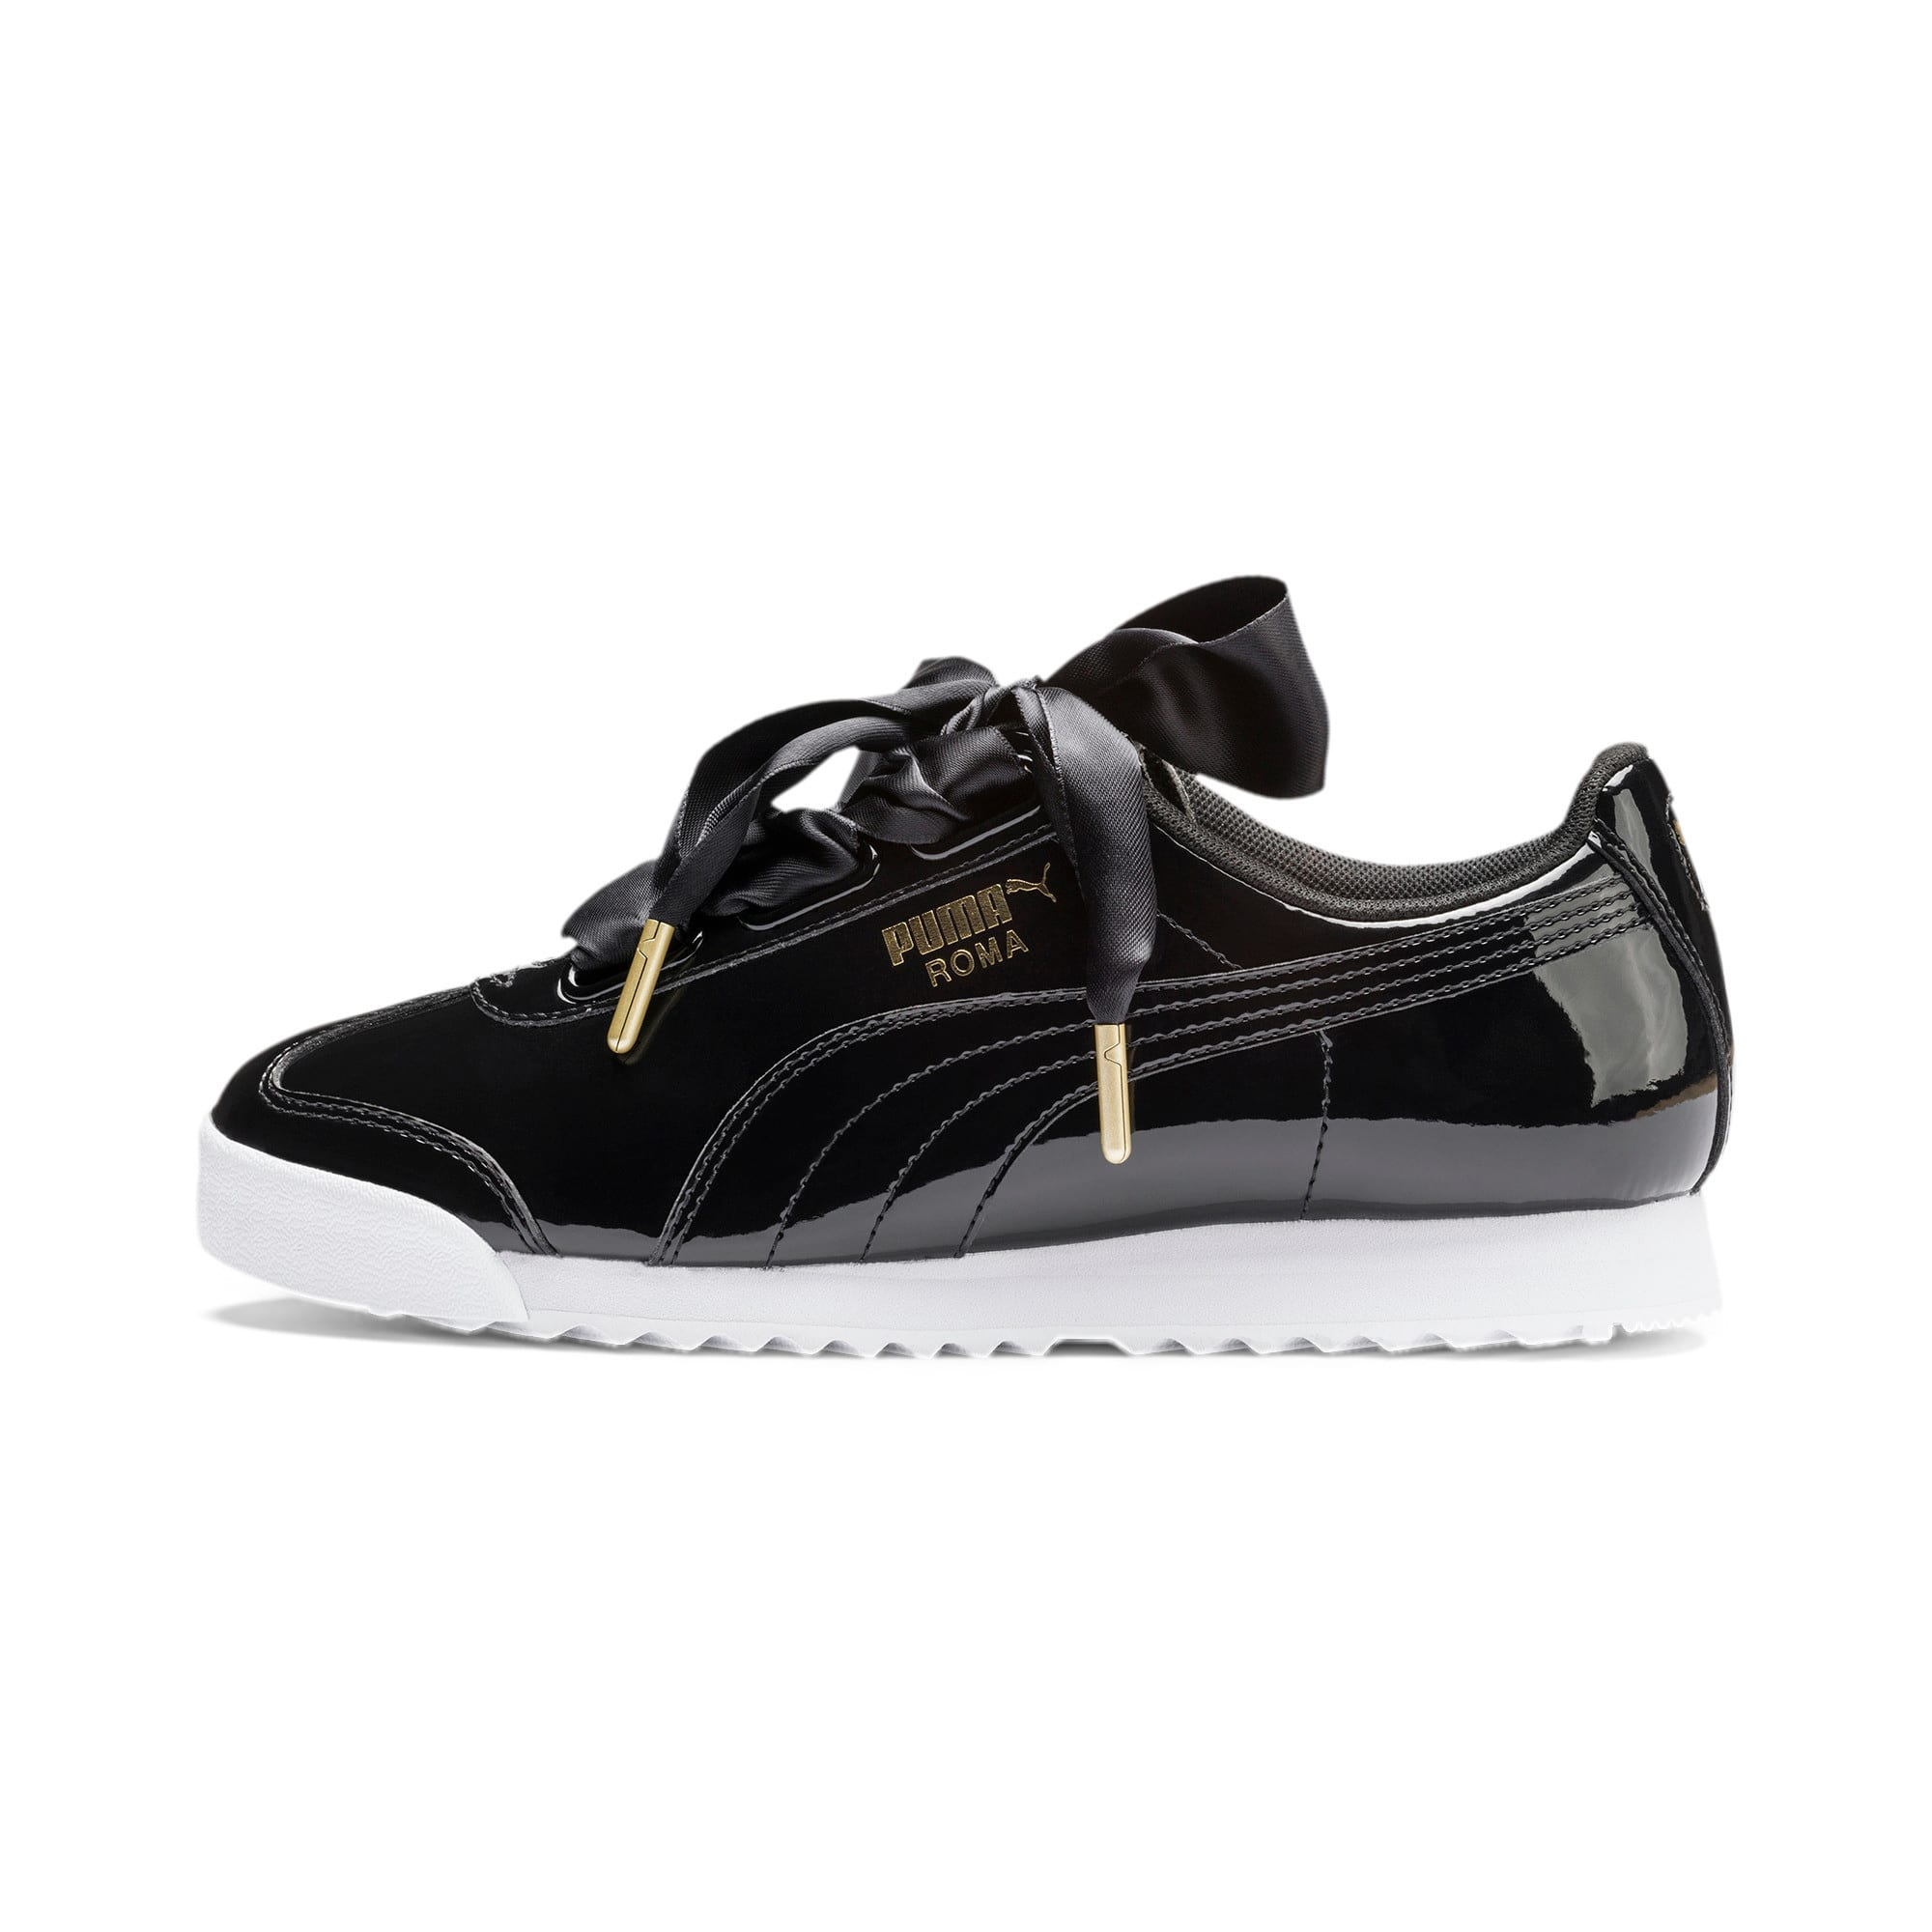 Thumbnail 1 of Roma Heart Patent Women's Sneakers, Puma Black-Puma Team Gold, medium